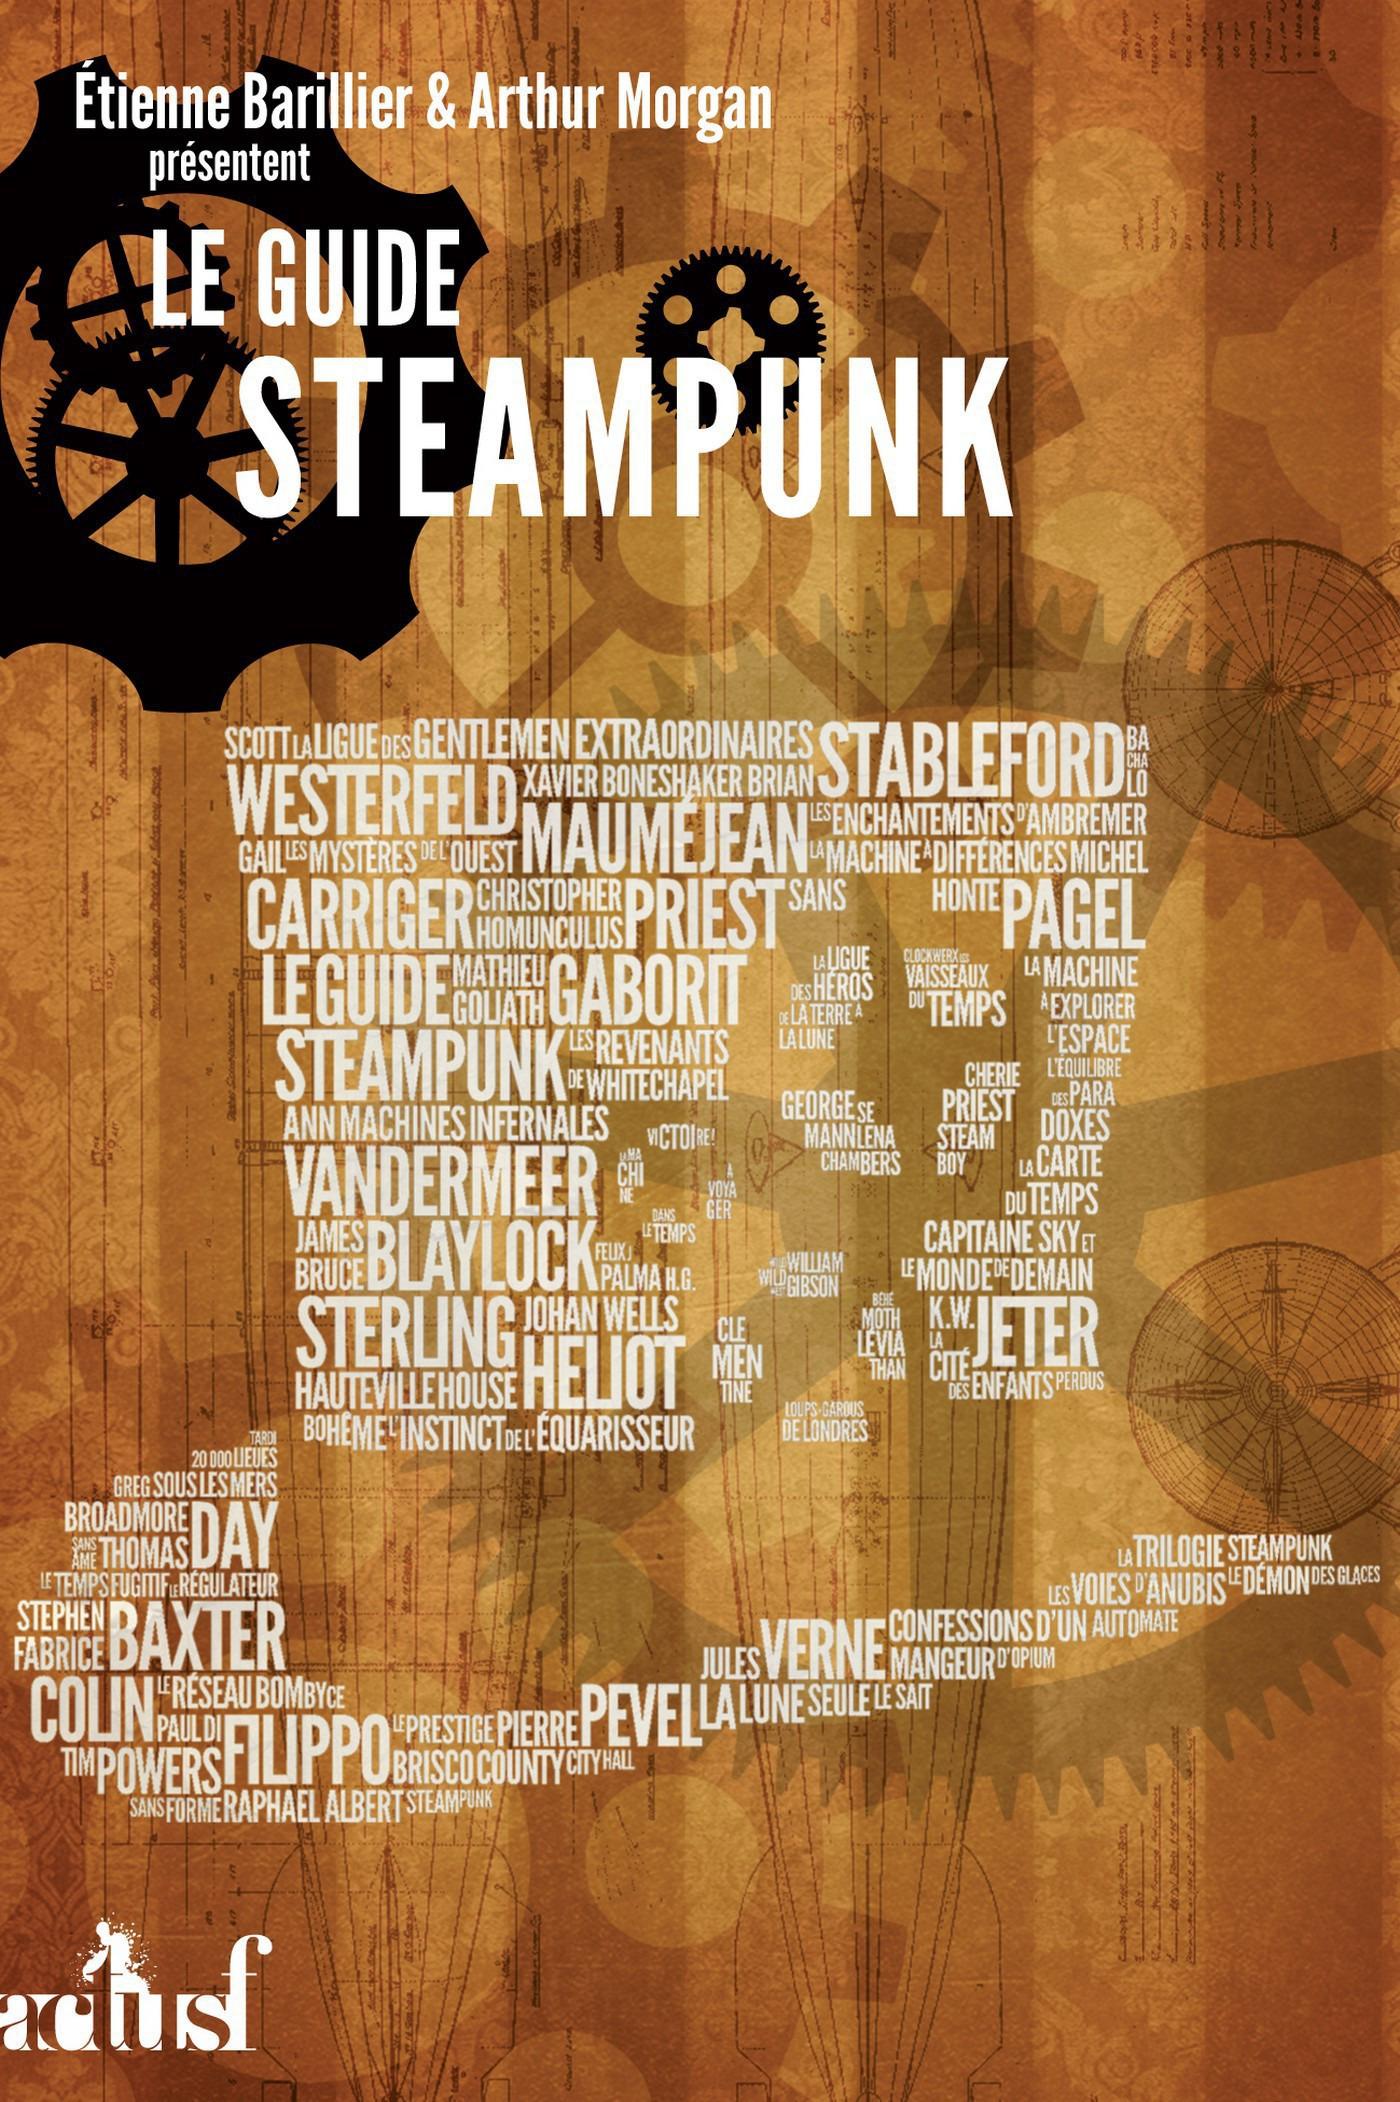 Le Guide steampunk  - Étienne Barillier  - Arthur Morgan